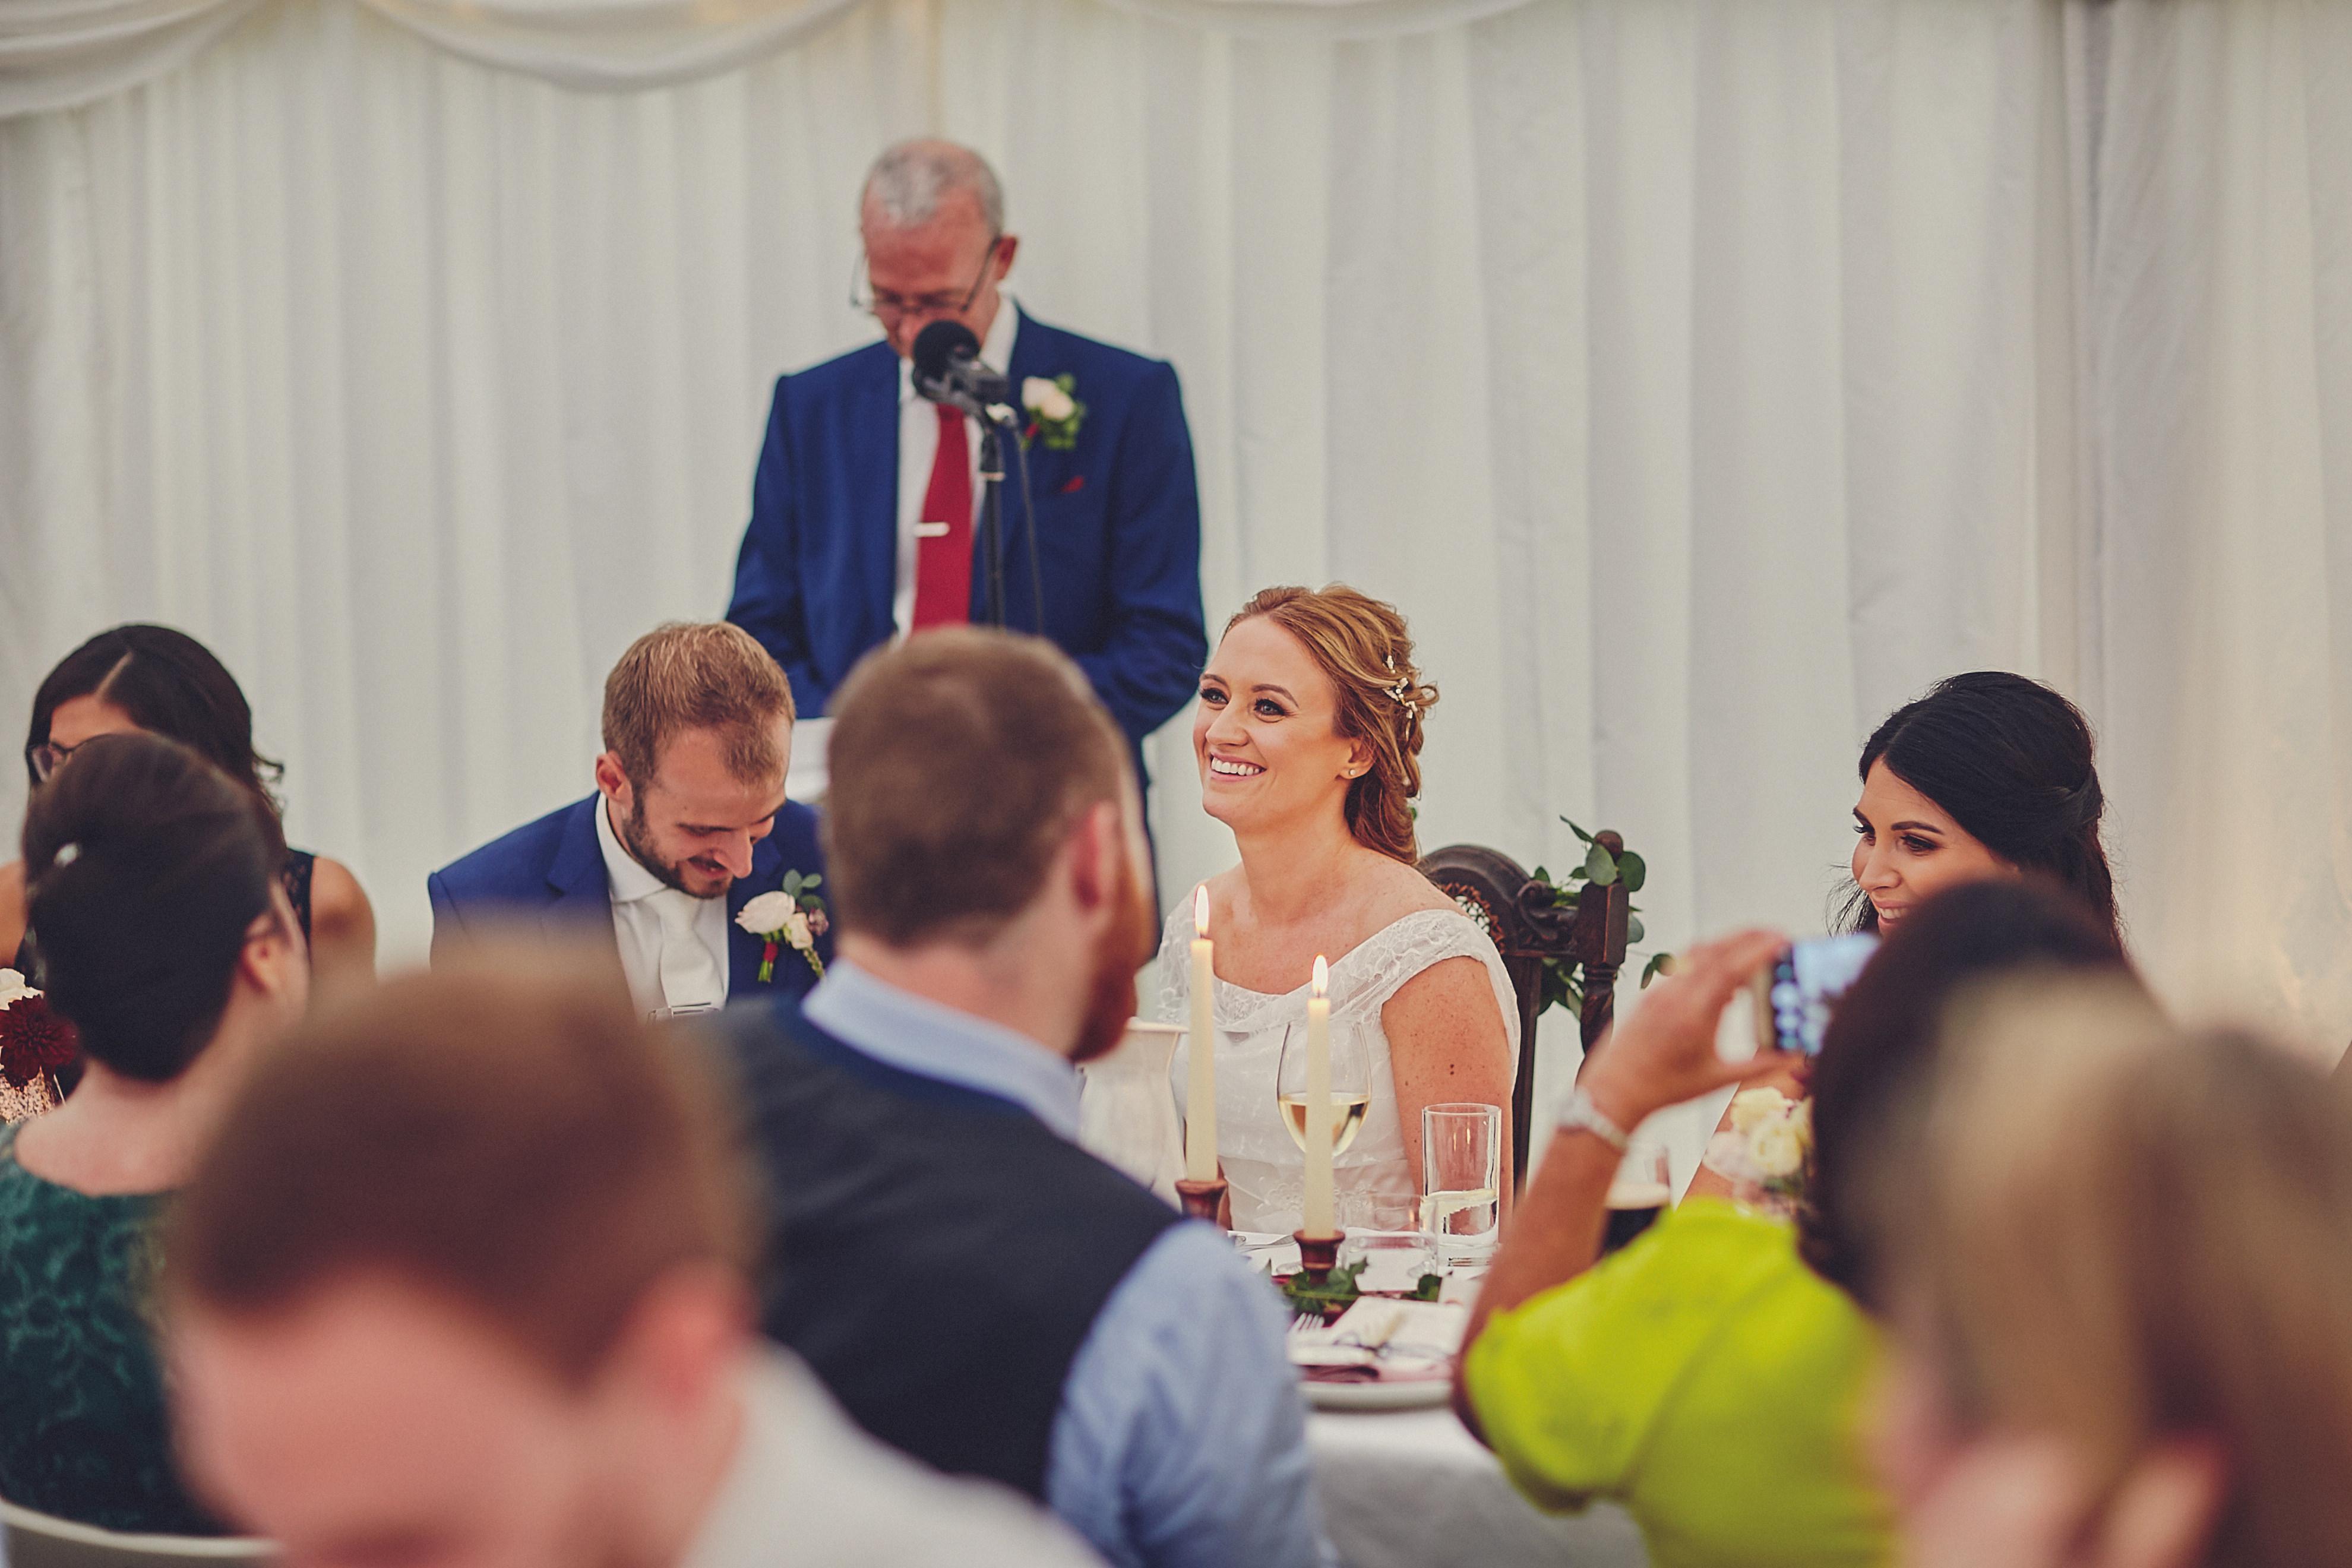 Cloughjordan House weddding130 - Cloughjordan House Wedding - Alternative Venue